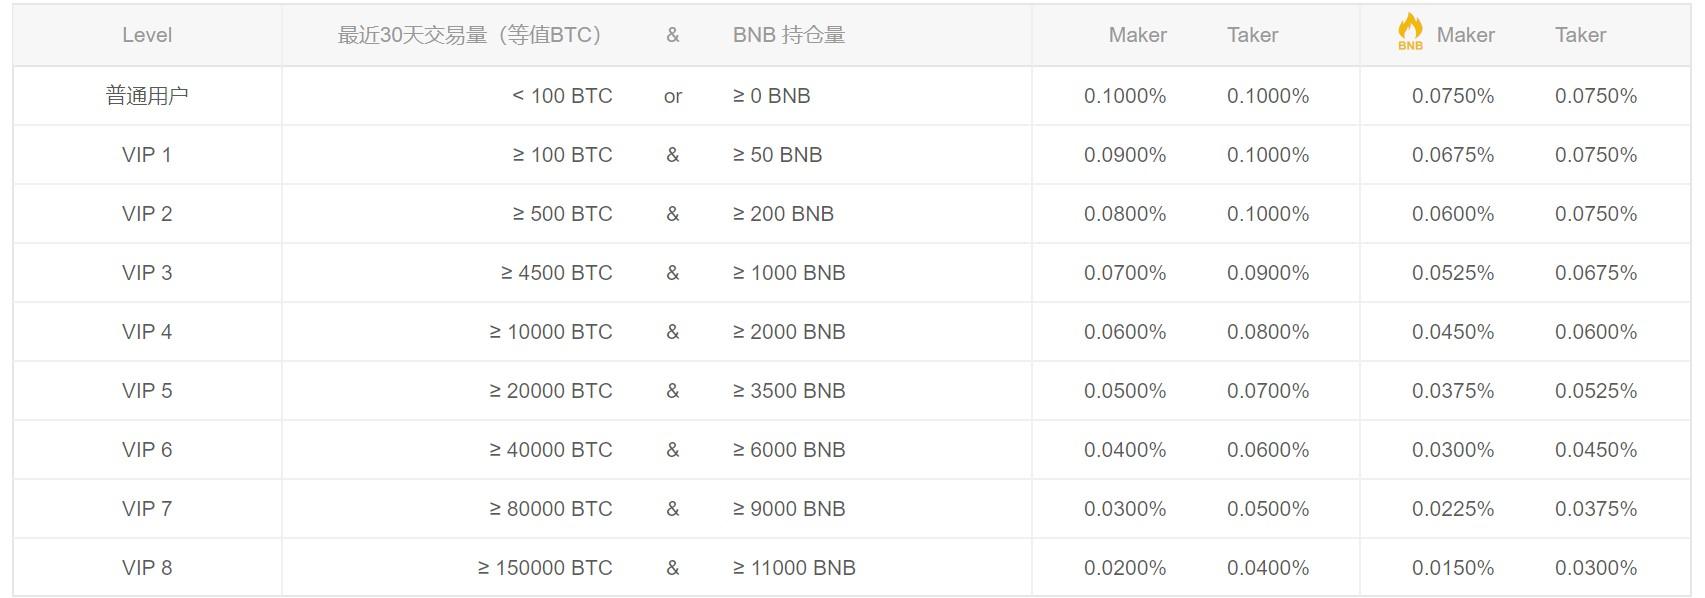 BitAsset3.0版本震撼登场,所有法币交易对手续费全免